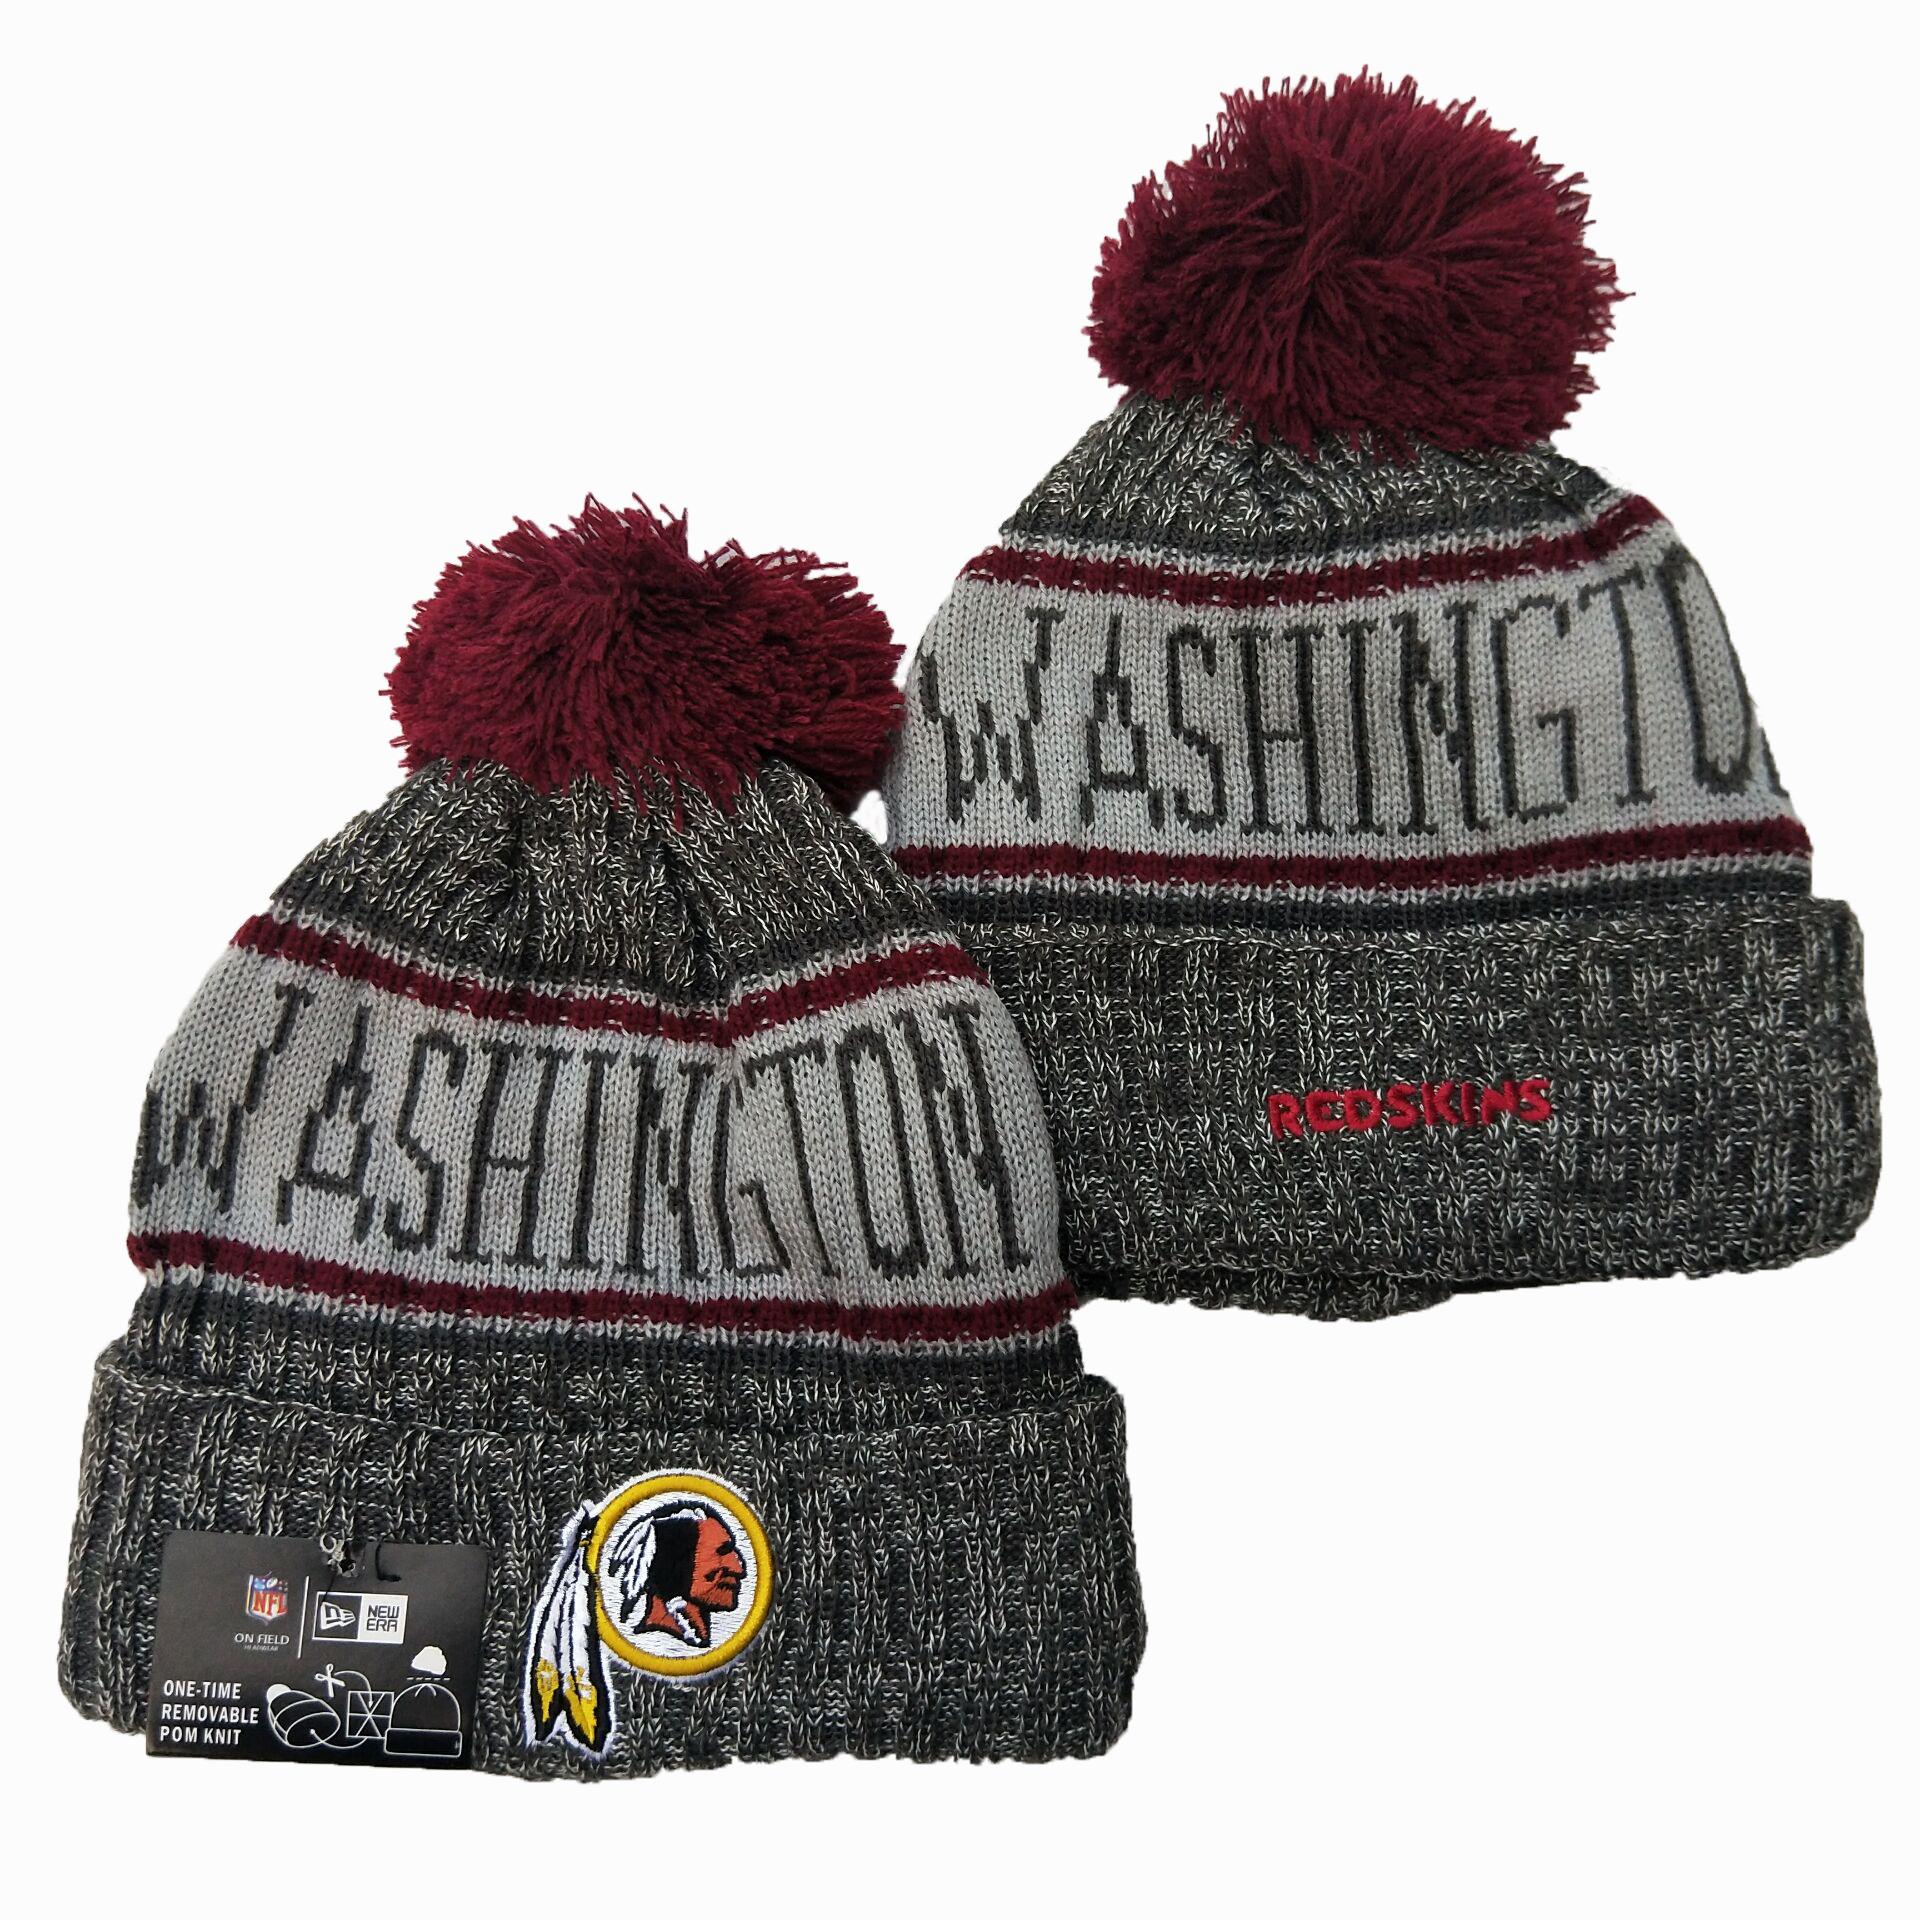 Redskins Team Logo Gray Pom Knit Hat YD